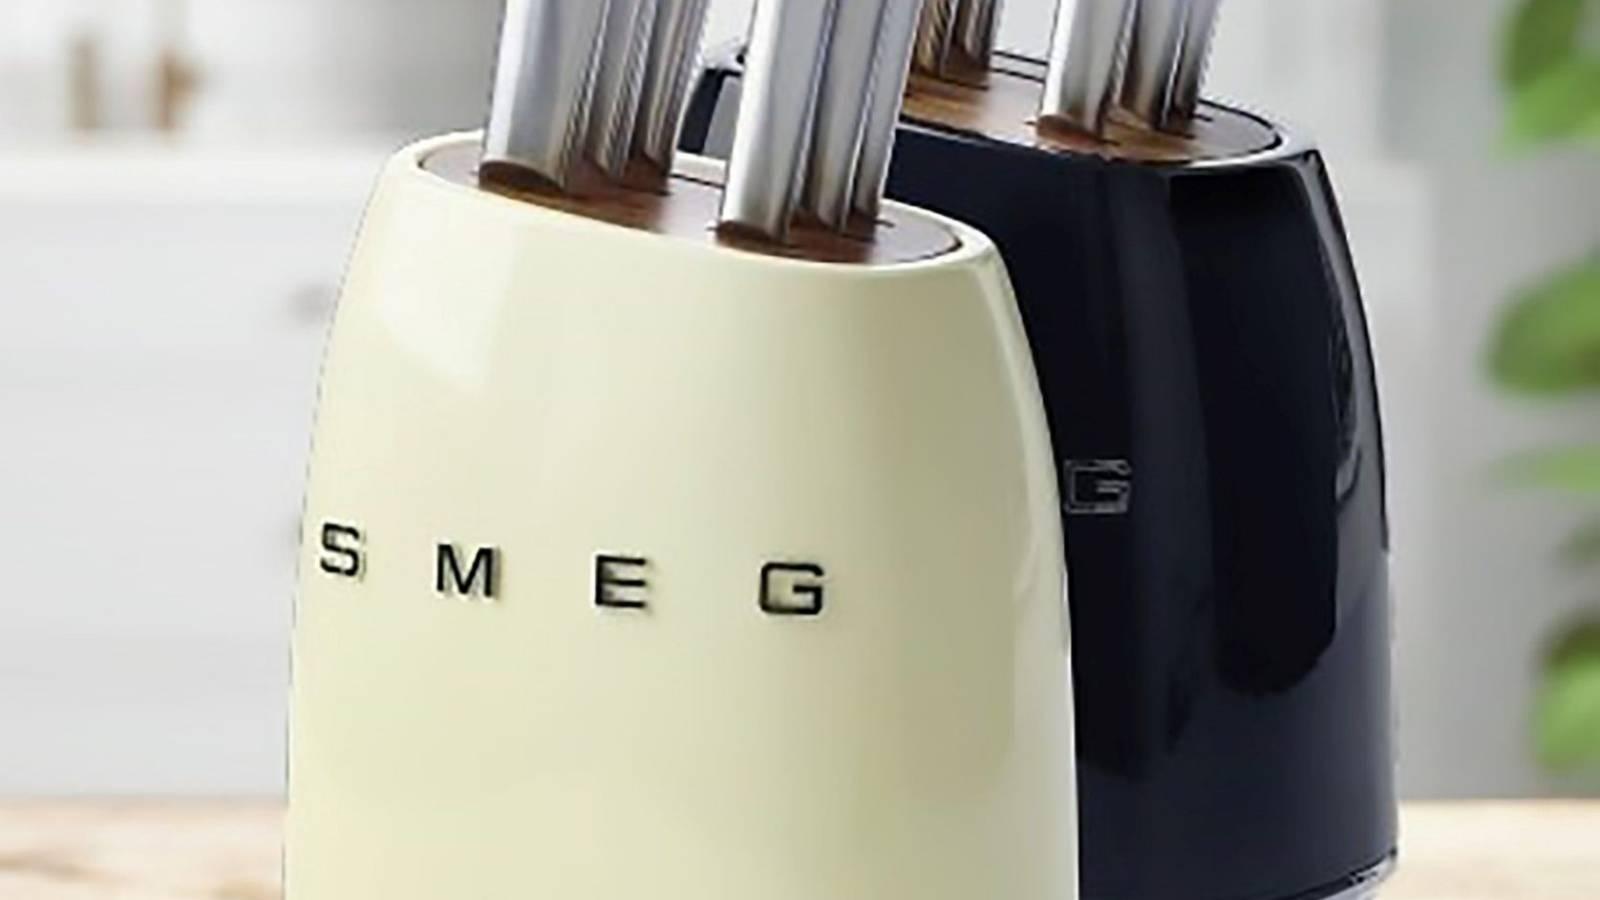 New World replacing blemished Smeg knives